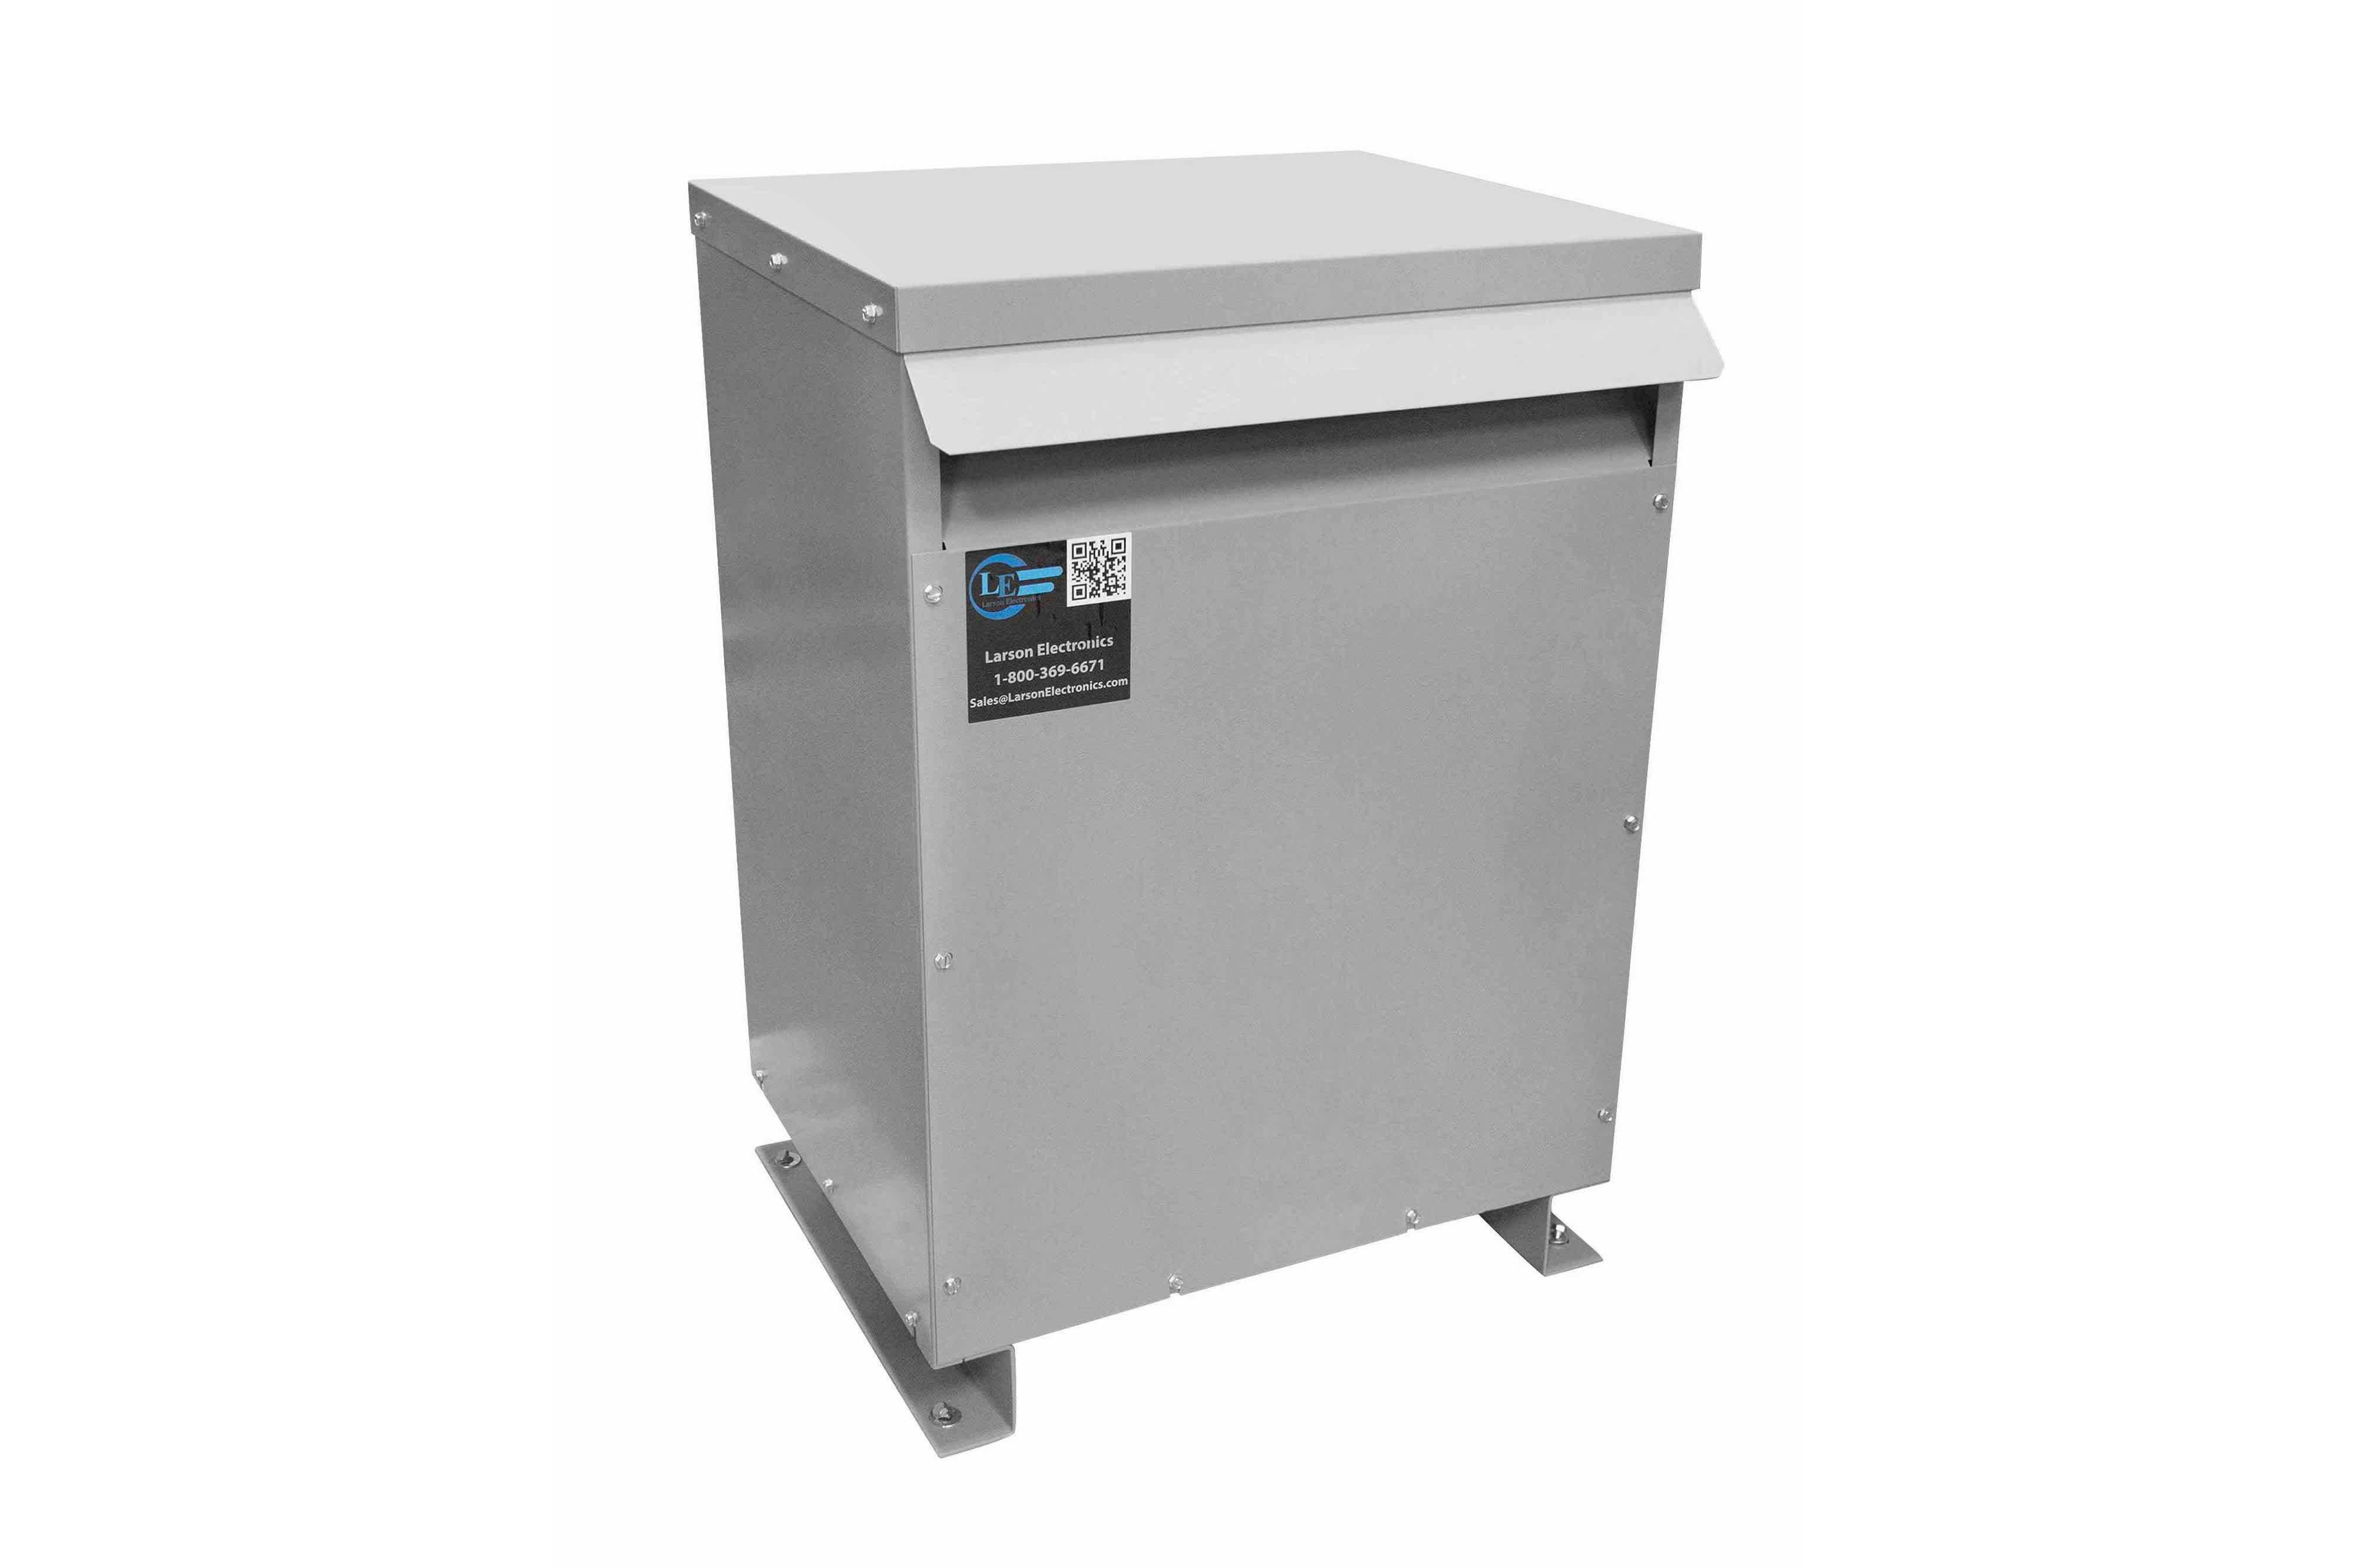 150 kVA 3PH DOE Transformer, 220V Delta Primary, 208Y/120 Wye-N Secondary, N3R, Ventilated, 60 Hz